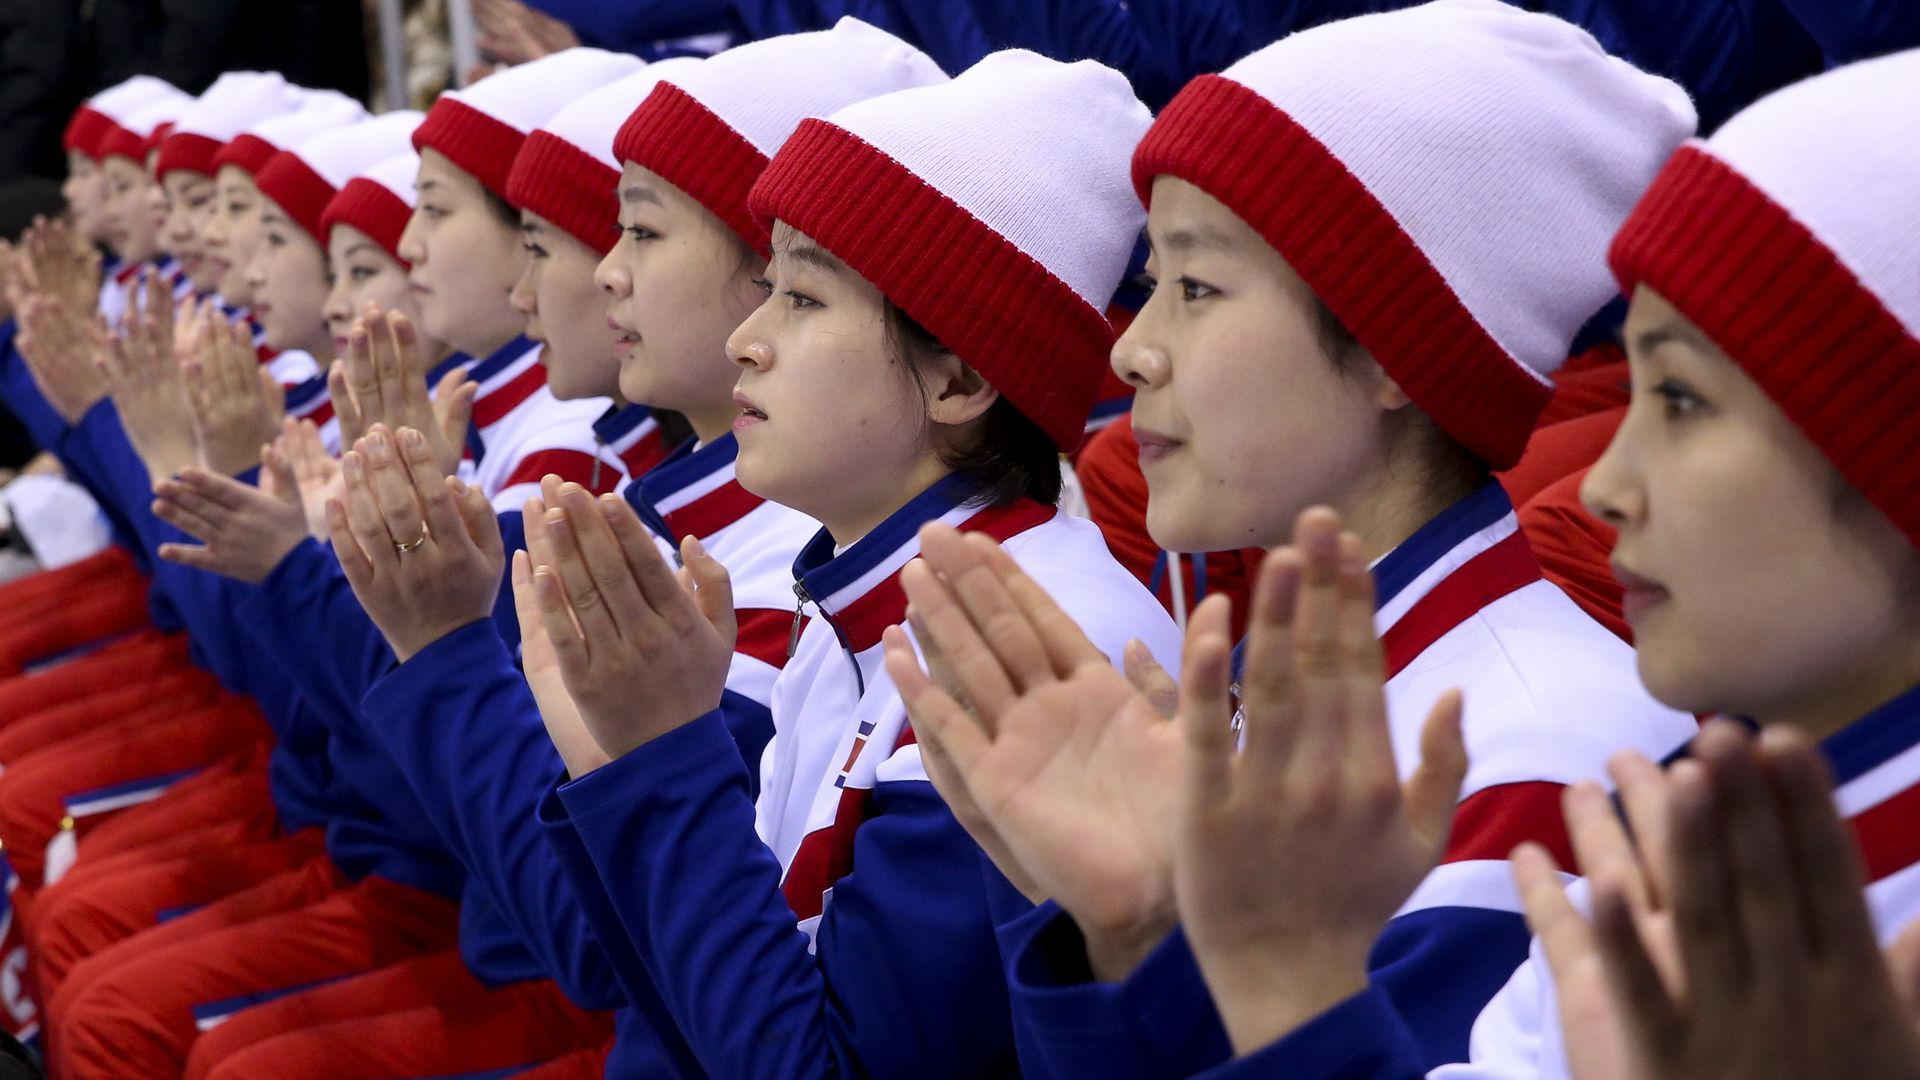 The North Korean 'pom pom girls.'